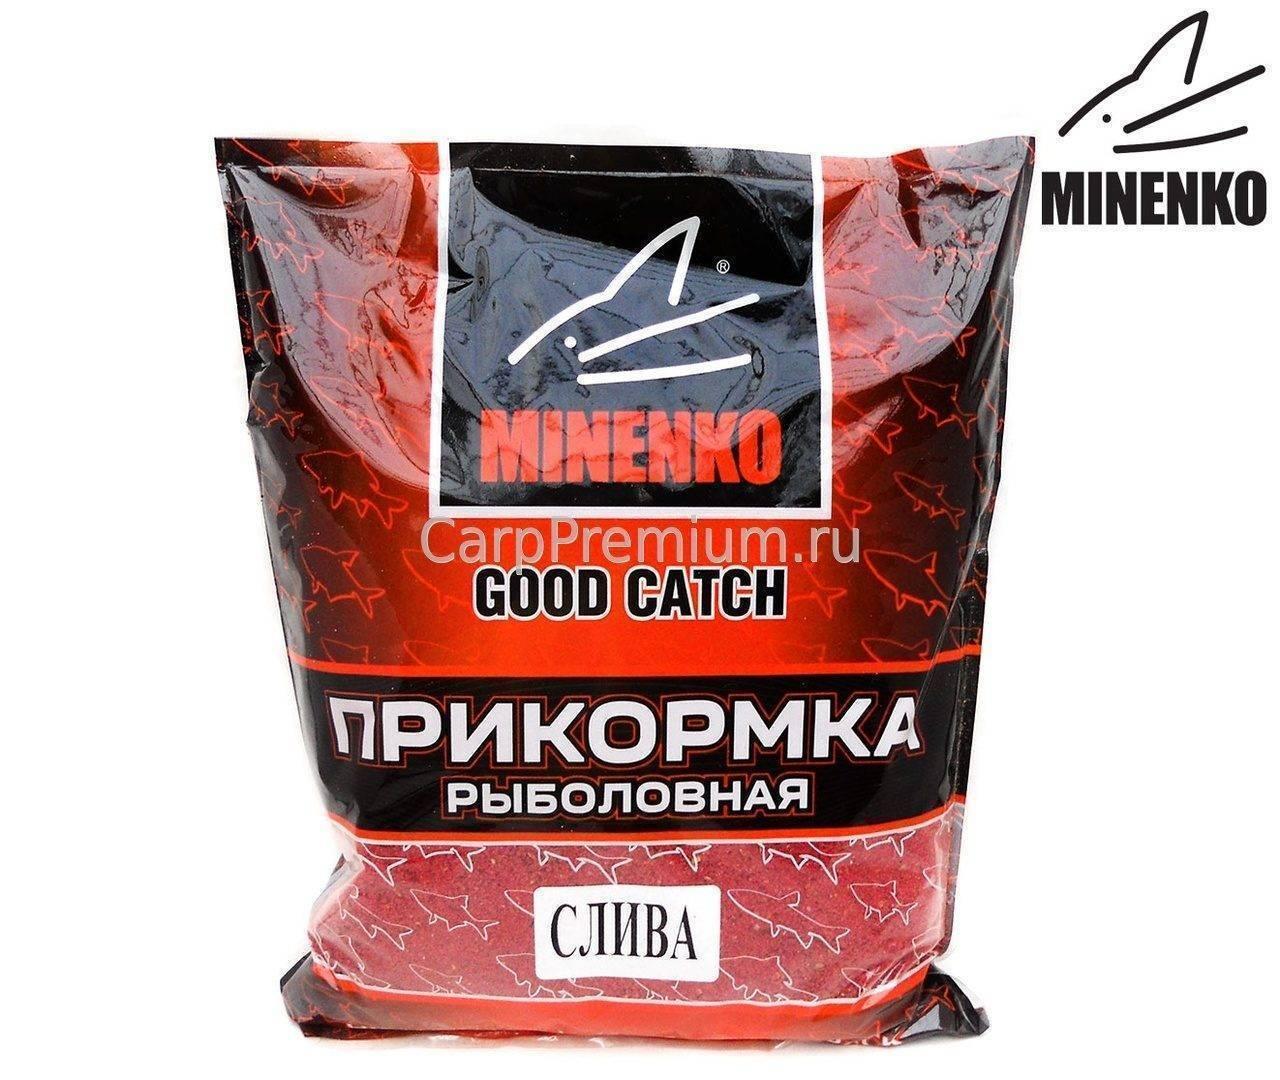 Прикормки minenko